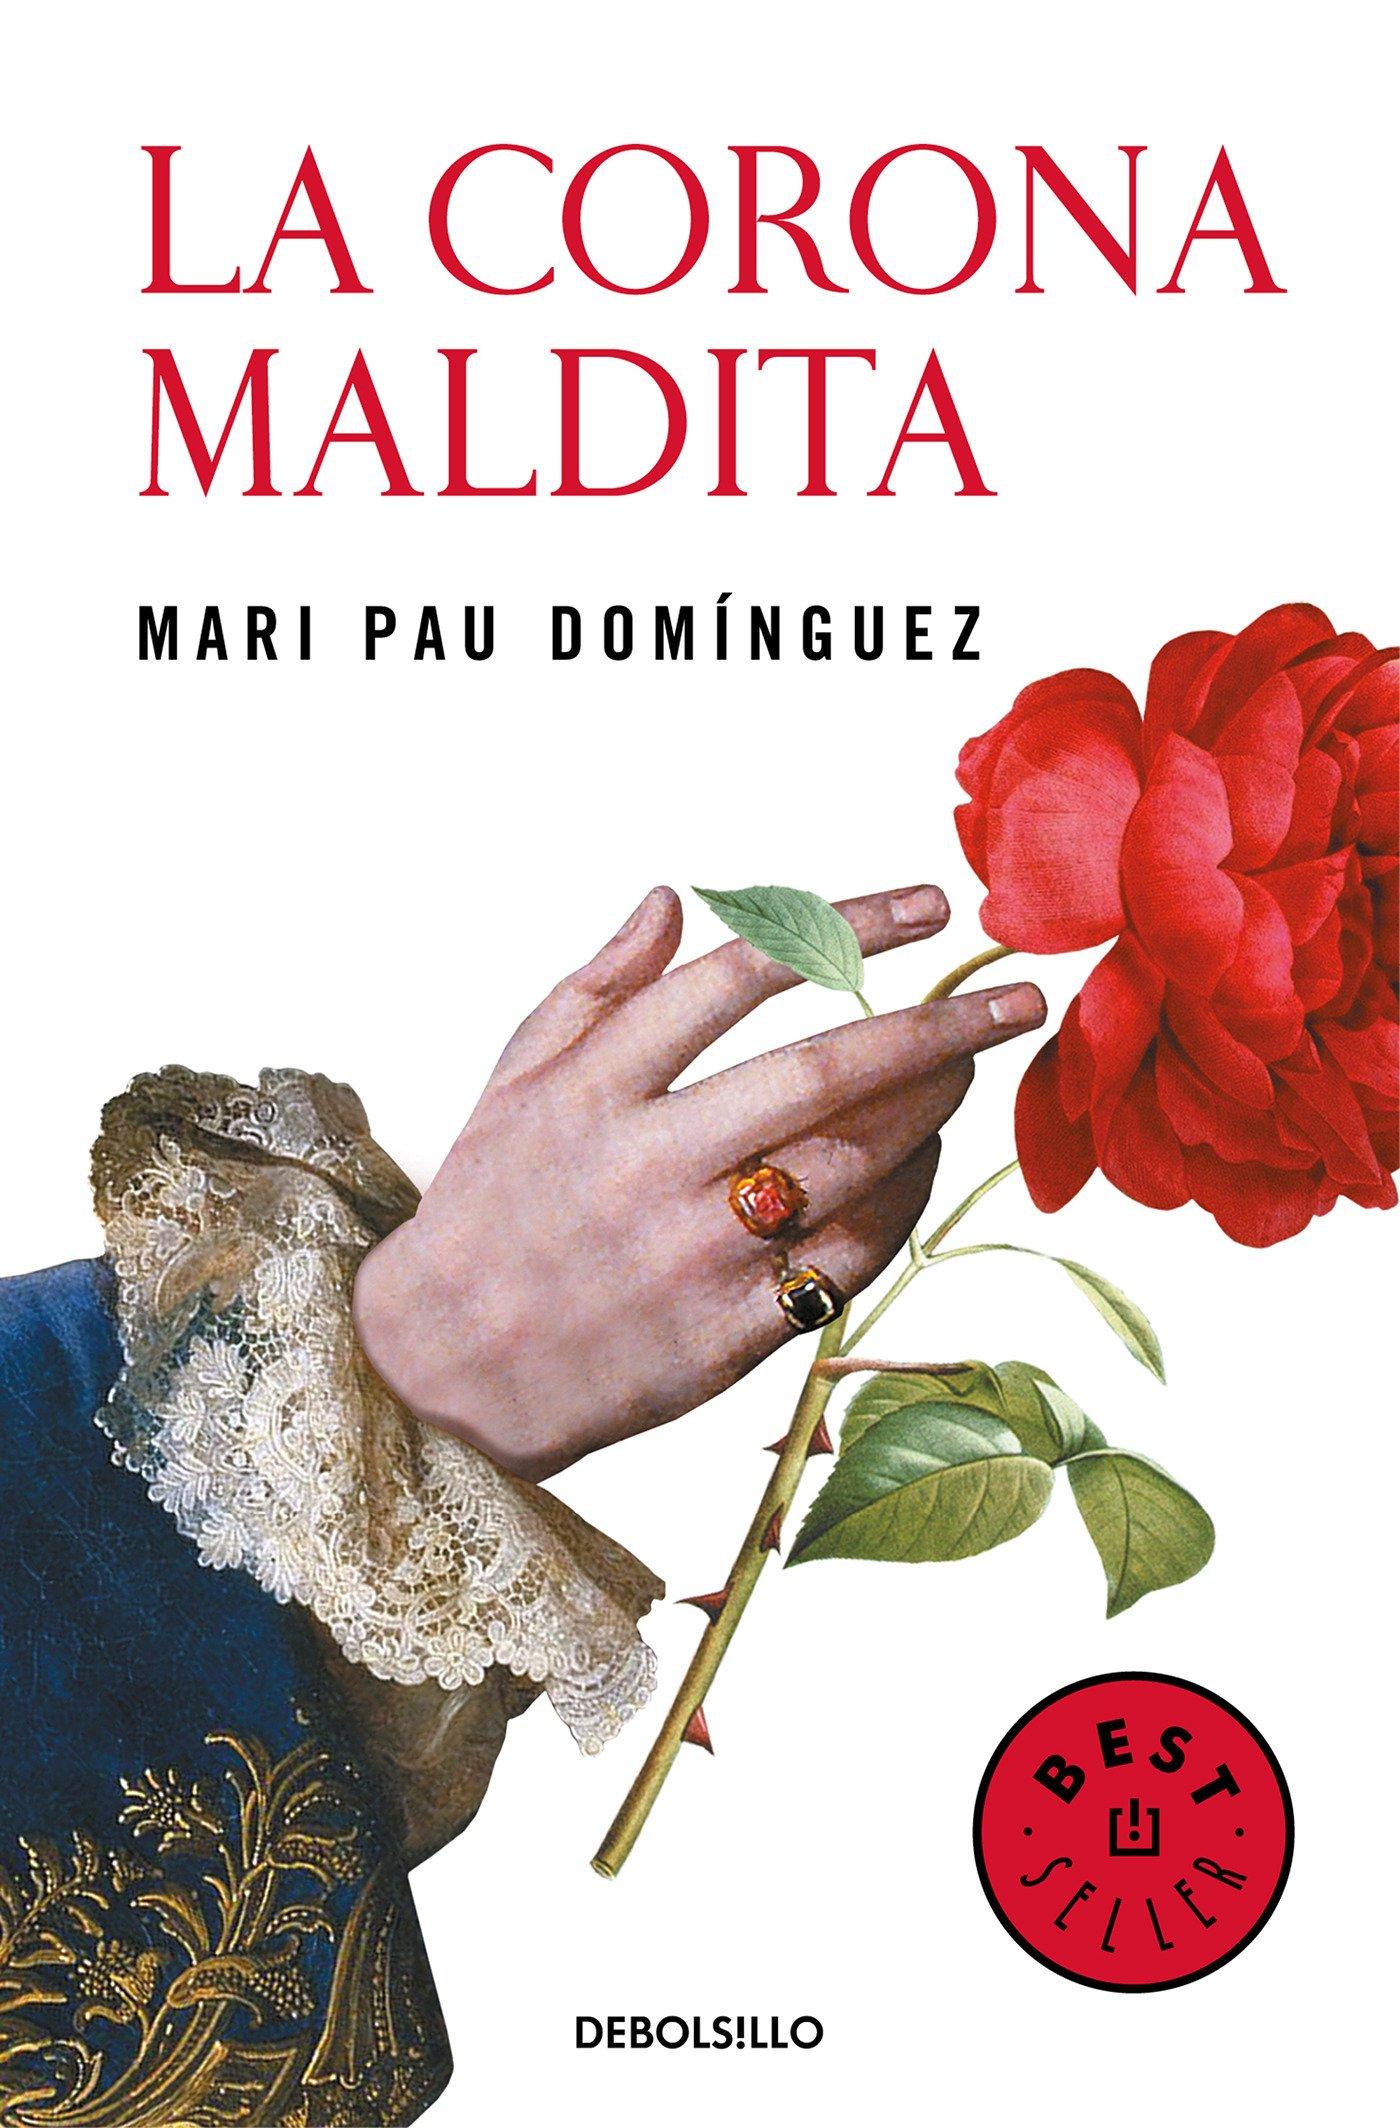 La corona maldita (Best Seller): Amazon.es: Domínguez, Mari Pau: Libros